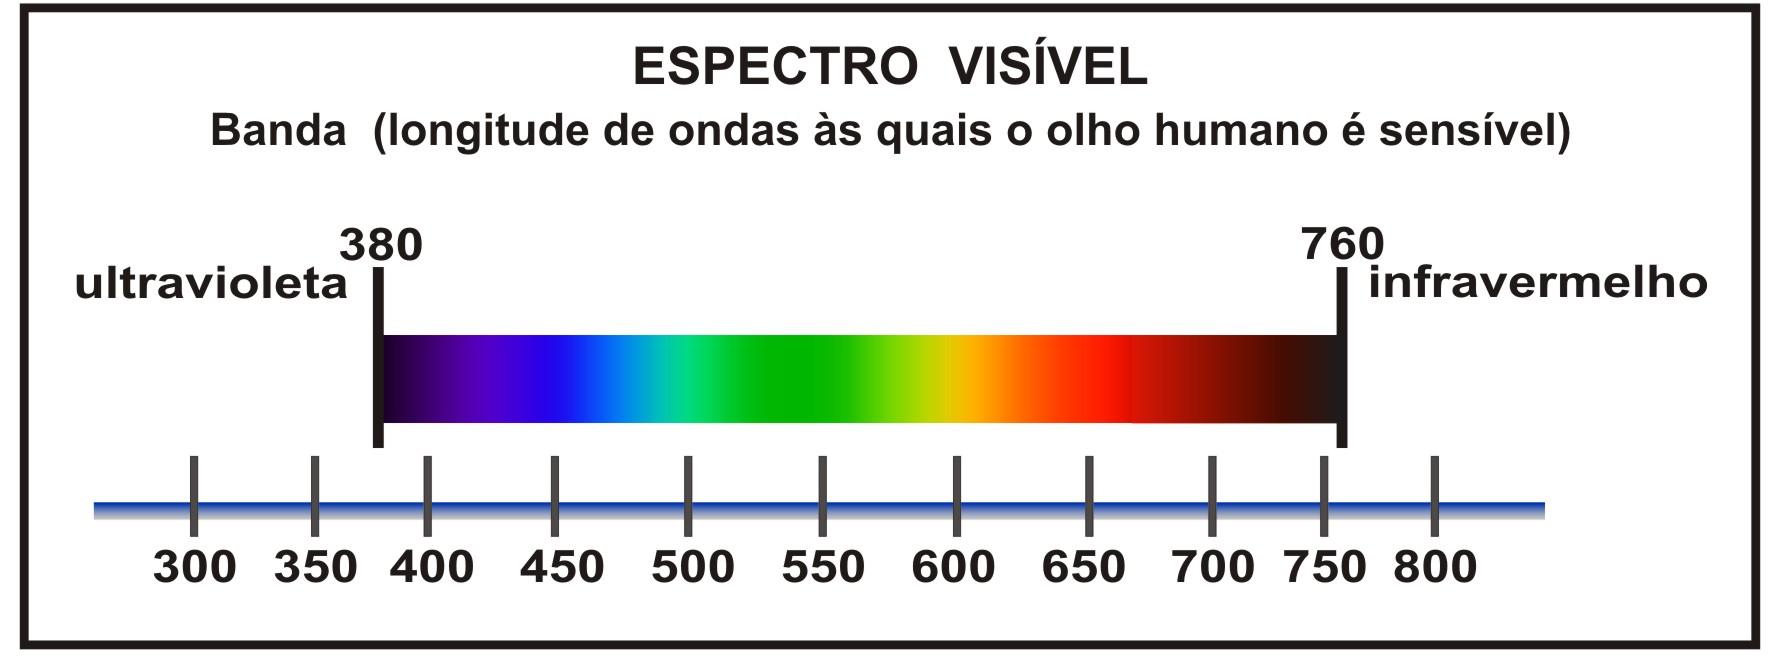 Resultado de imagem para espectro de cores visivel